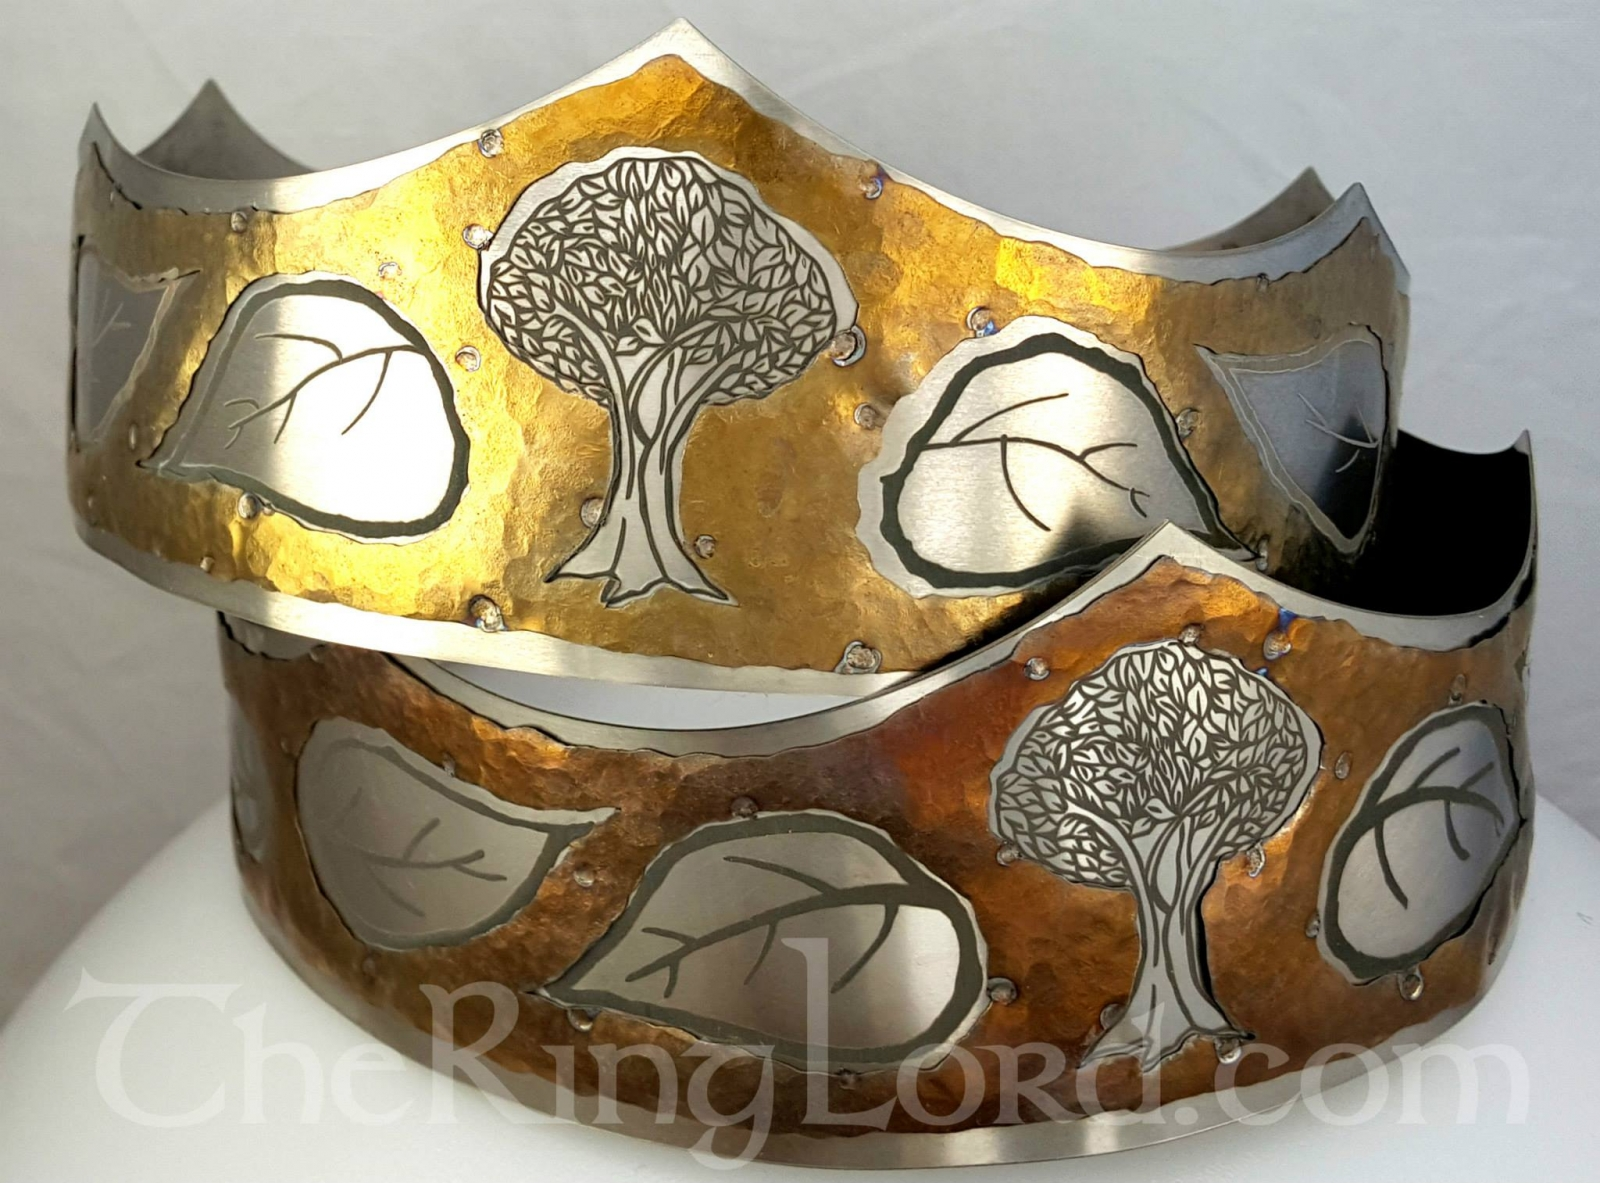 Myrgan Wood Coronets